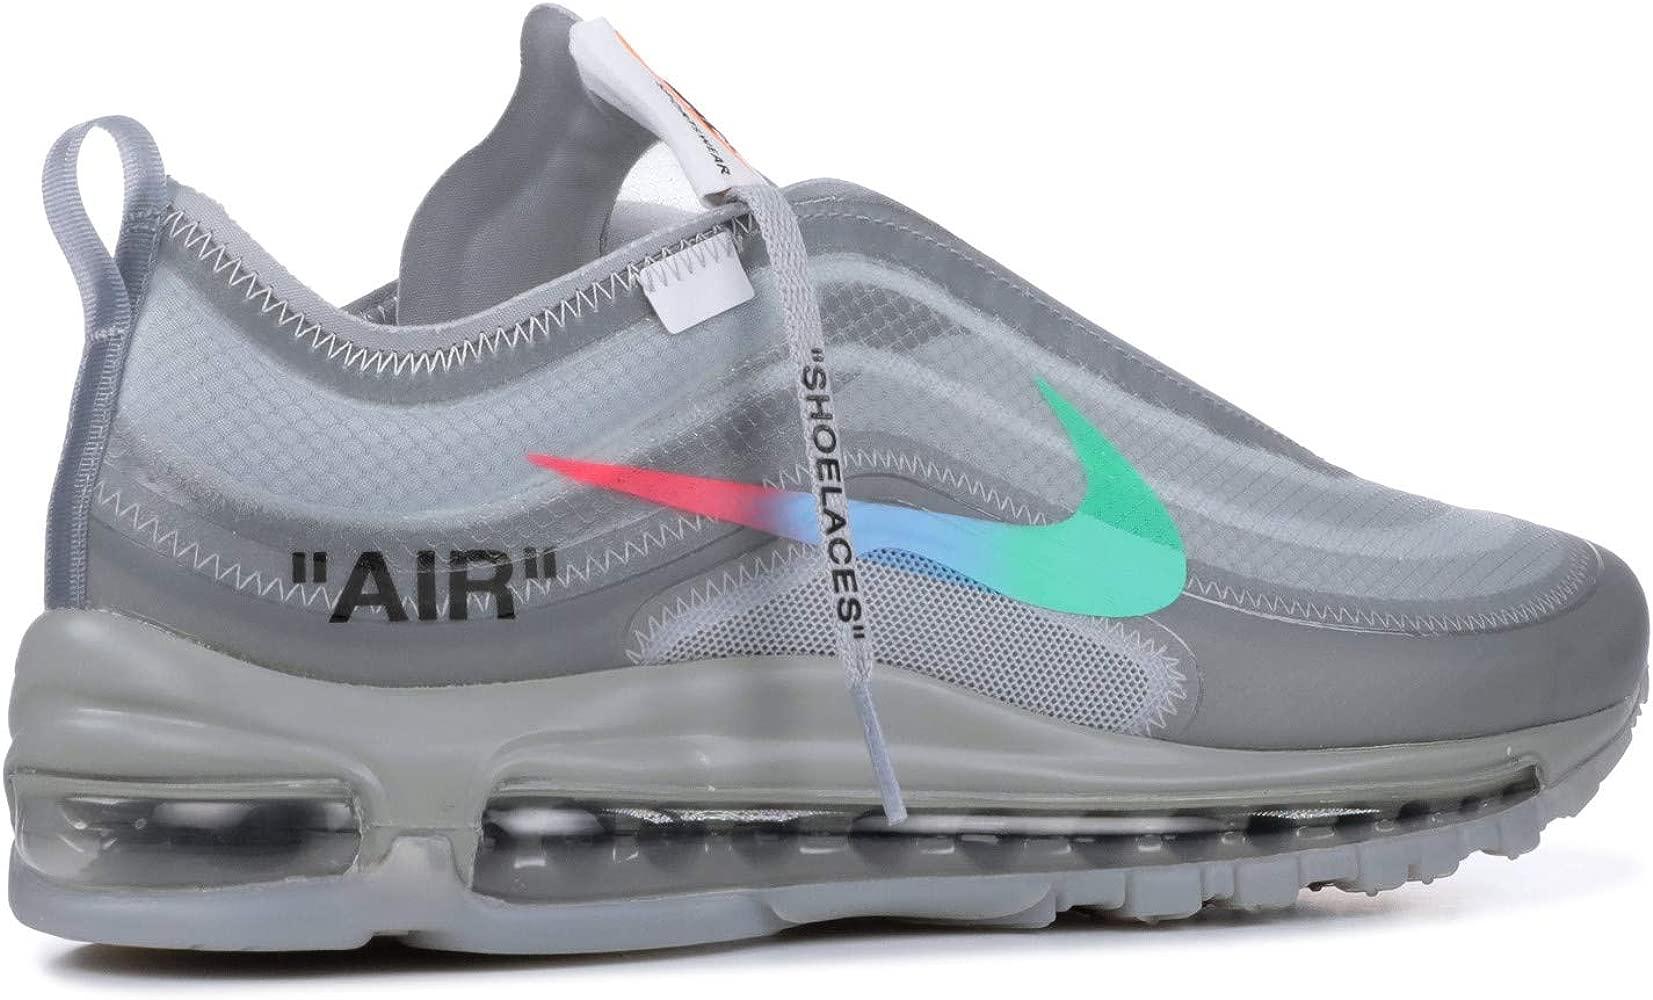 Nike The 10 AIR MAX 97 OG 'Off White' AJ4585 101 Size